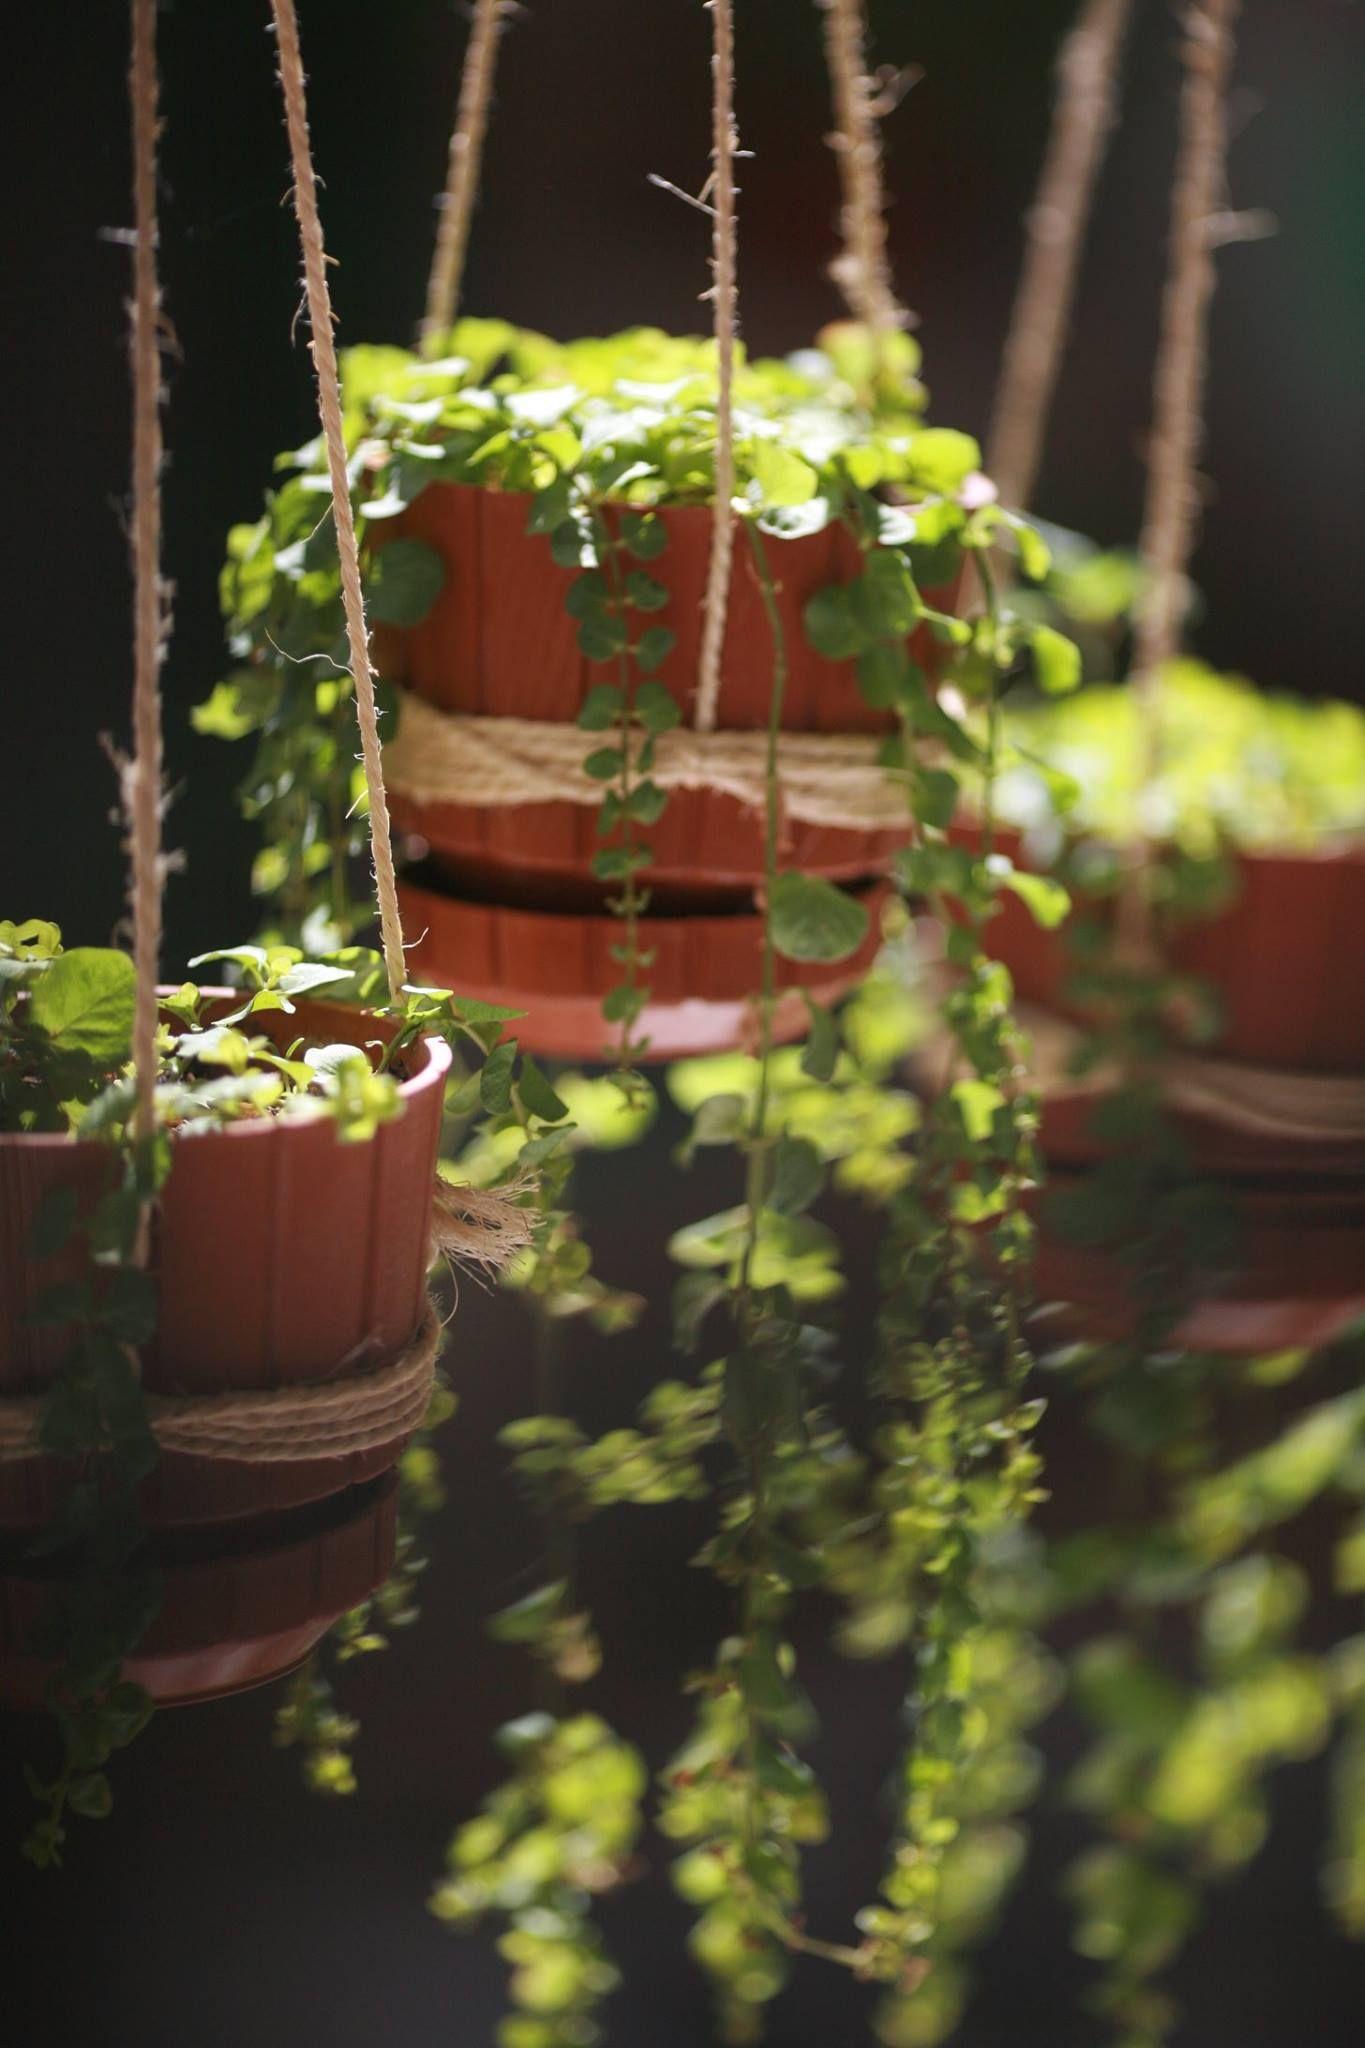 Pin by Gülbahar on vaynefoto   Pinterest   Plants, Gardens and Flowers